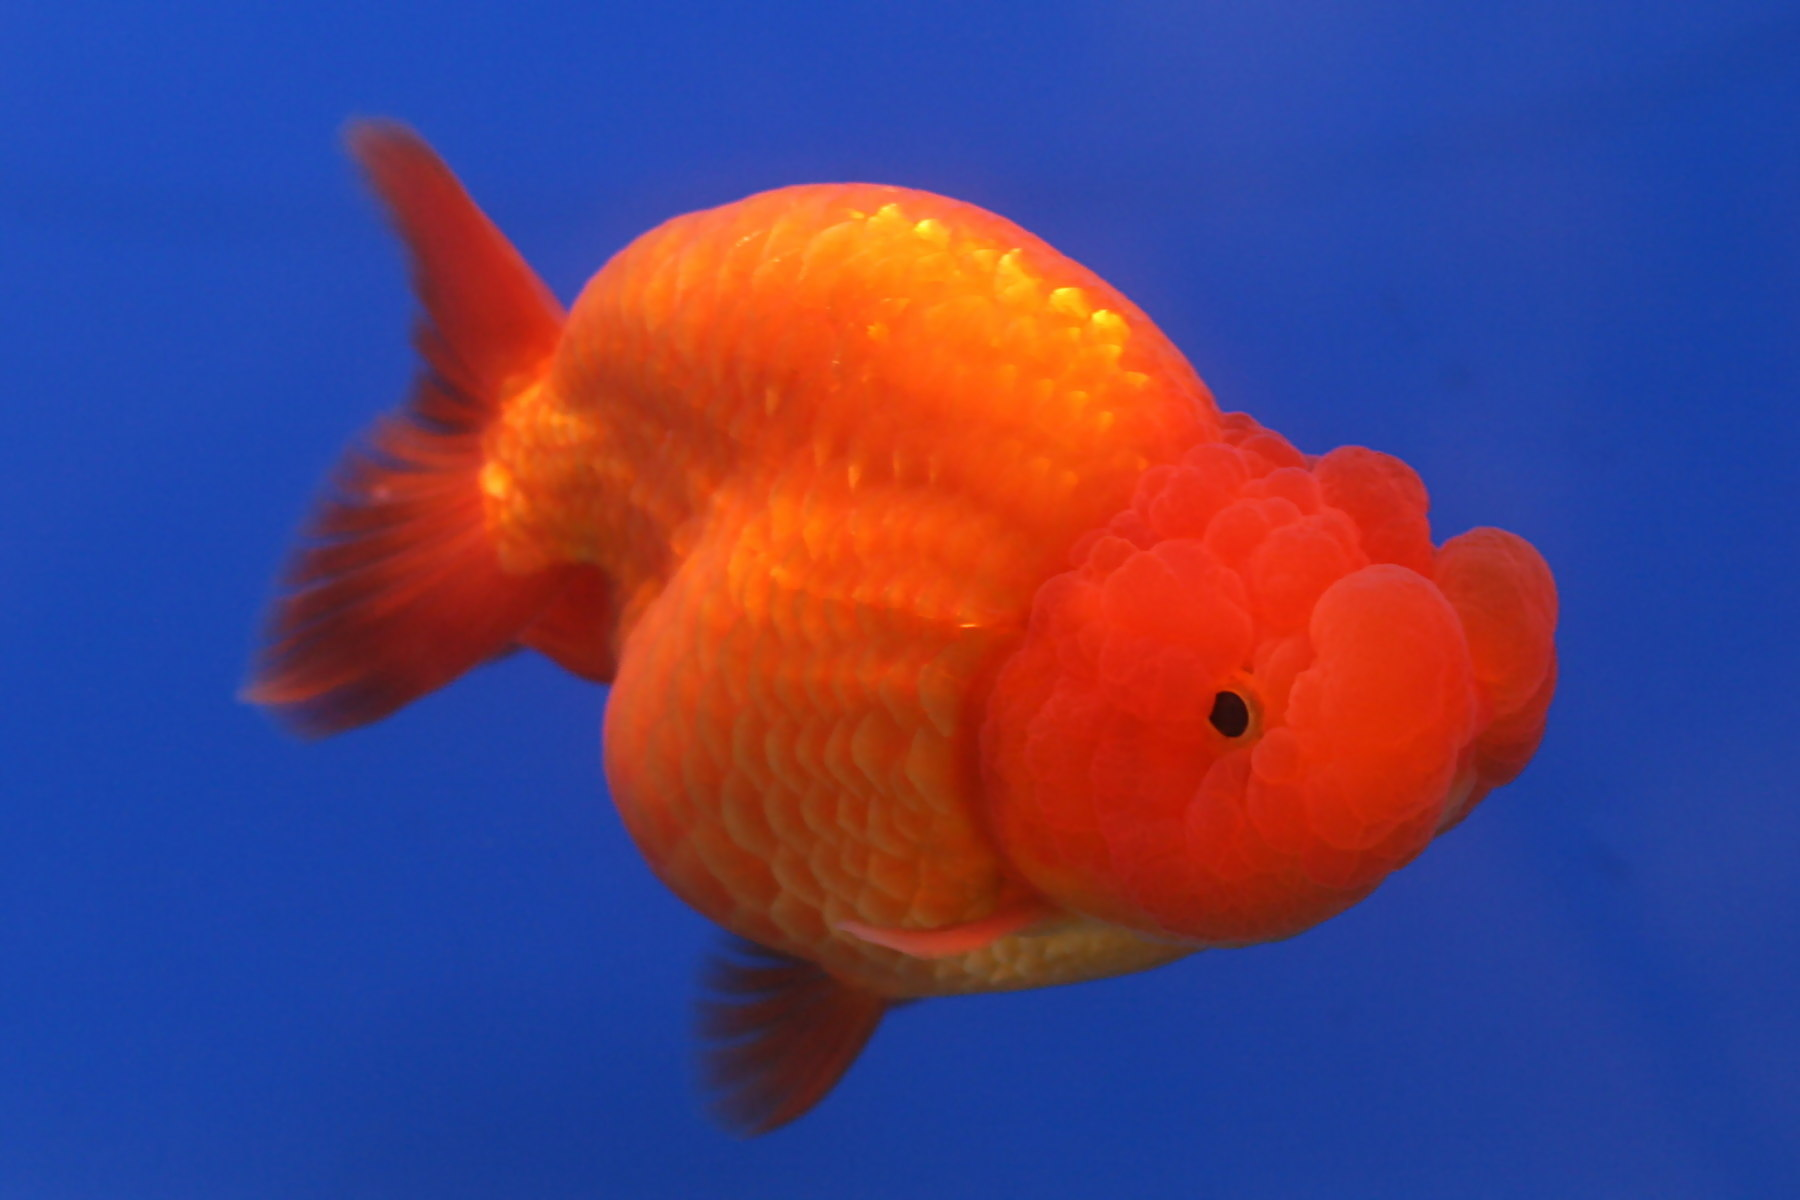 Wallpaper iphone ikan - Golden Fish Wallpapers